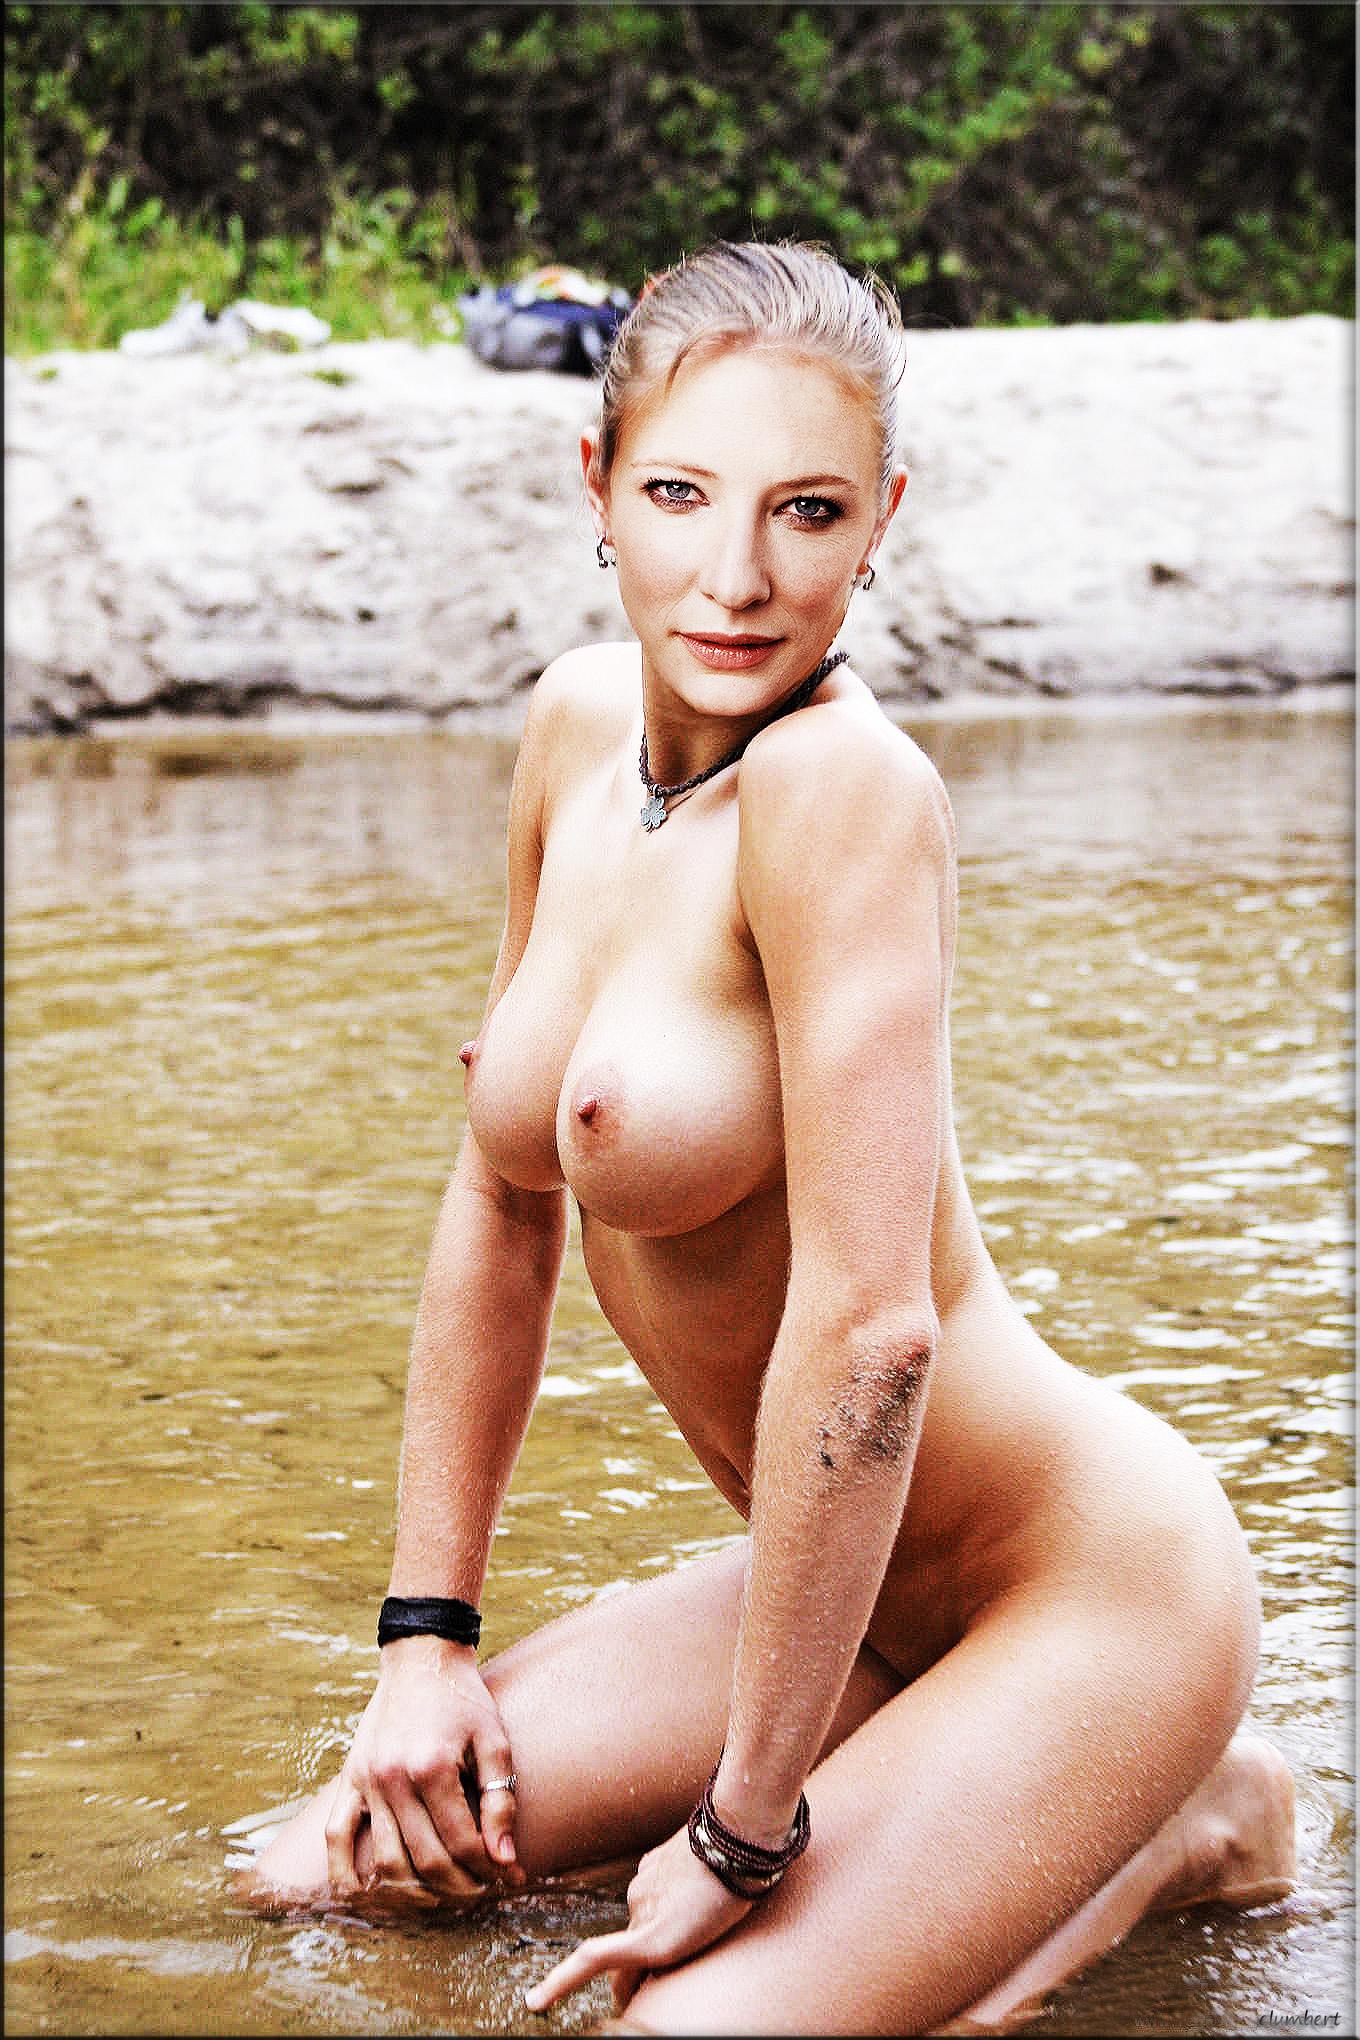 Erotica Klaudia Skogmo naked (76 photos), Sexy, Hot, Selfie, legs 2006